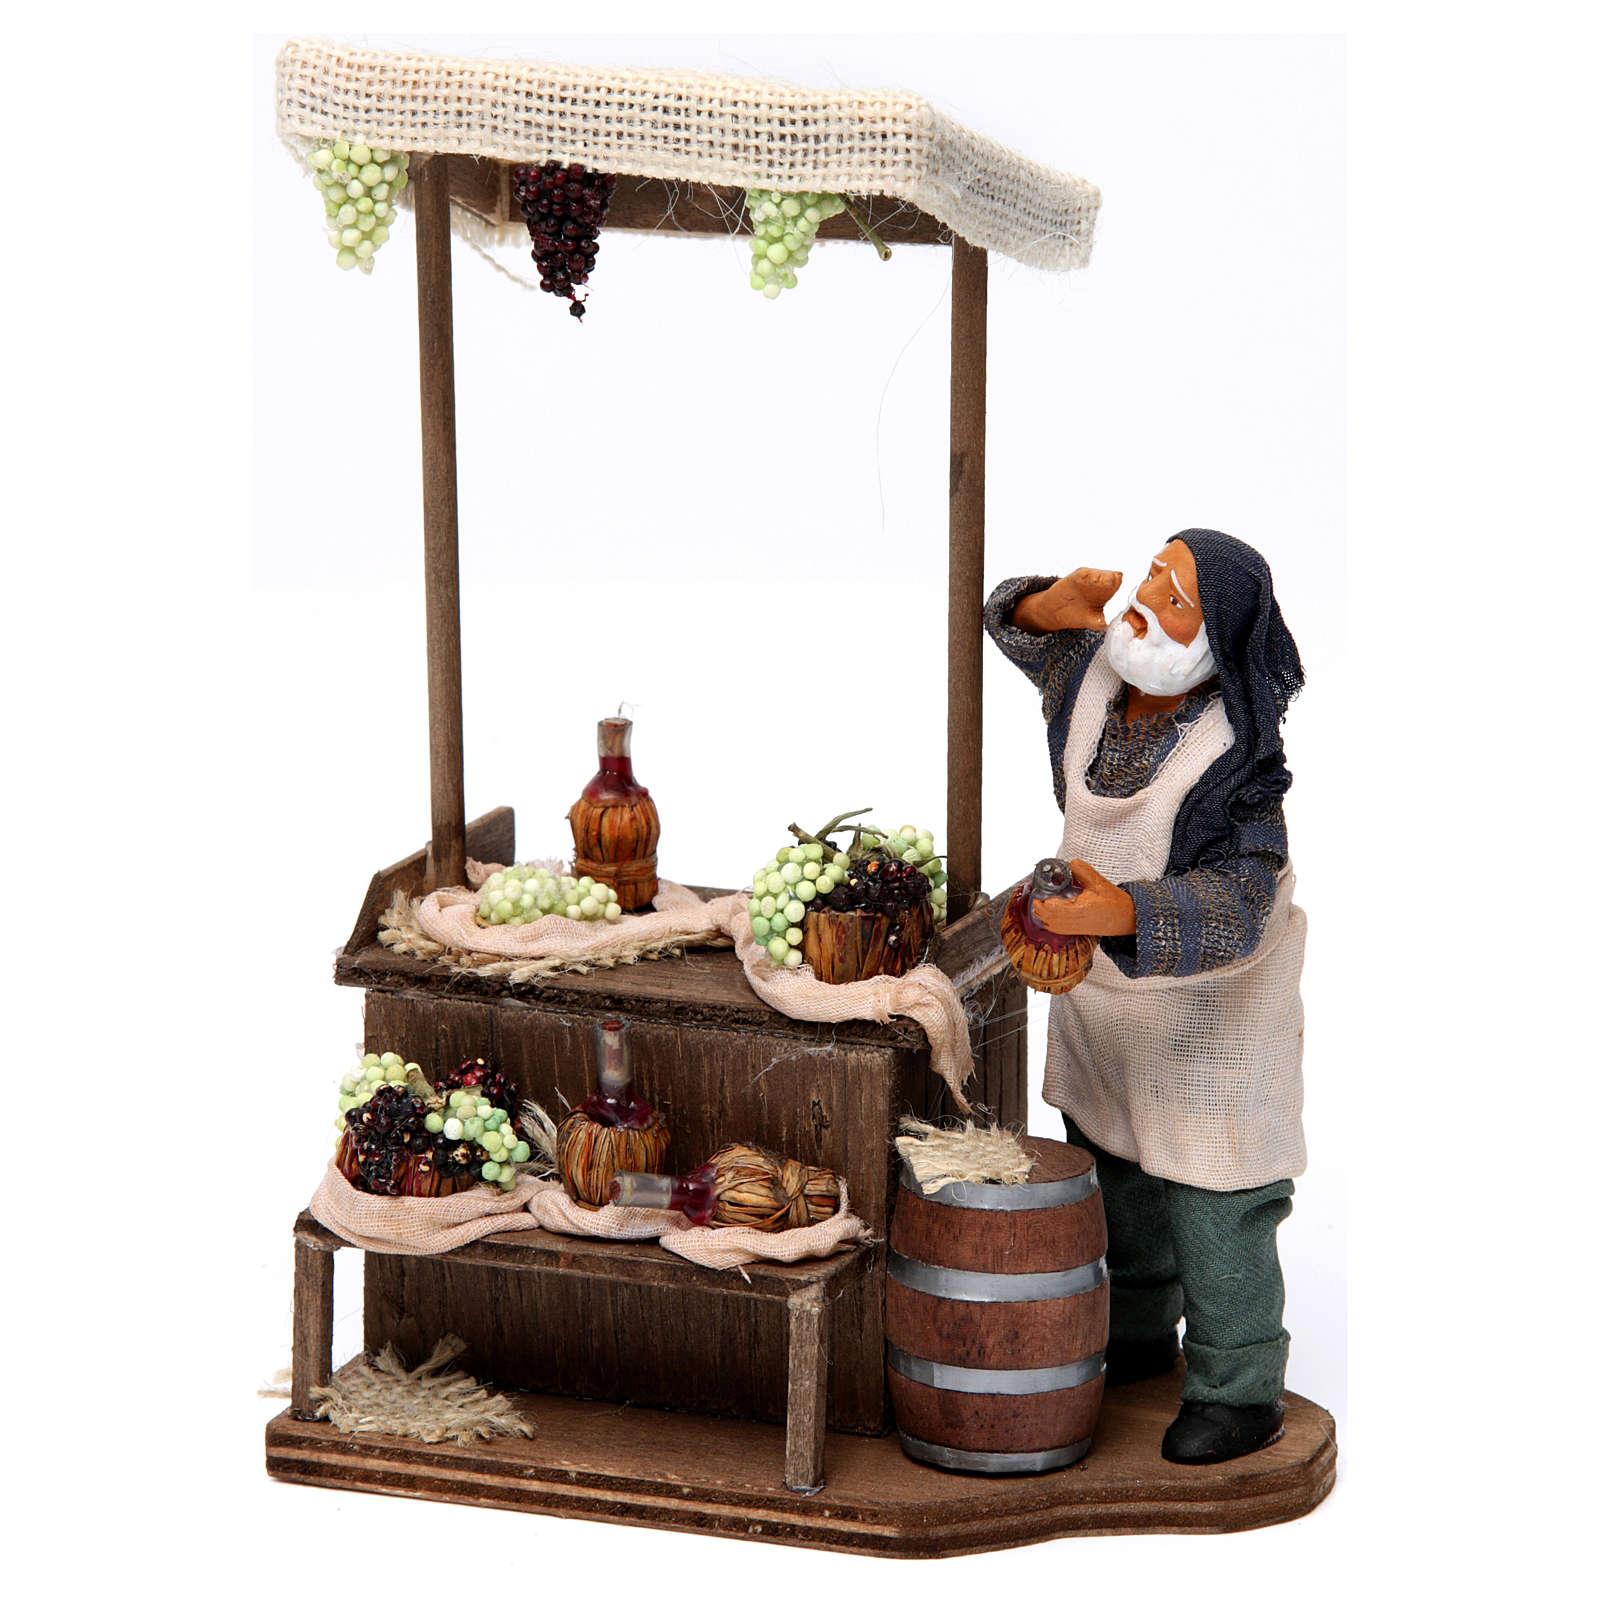 Vendedor de uva y vino terracota para belén Napolitano 12 cm de altura media 4